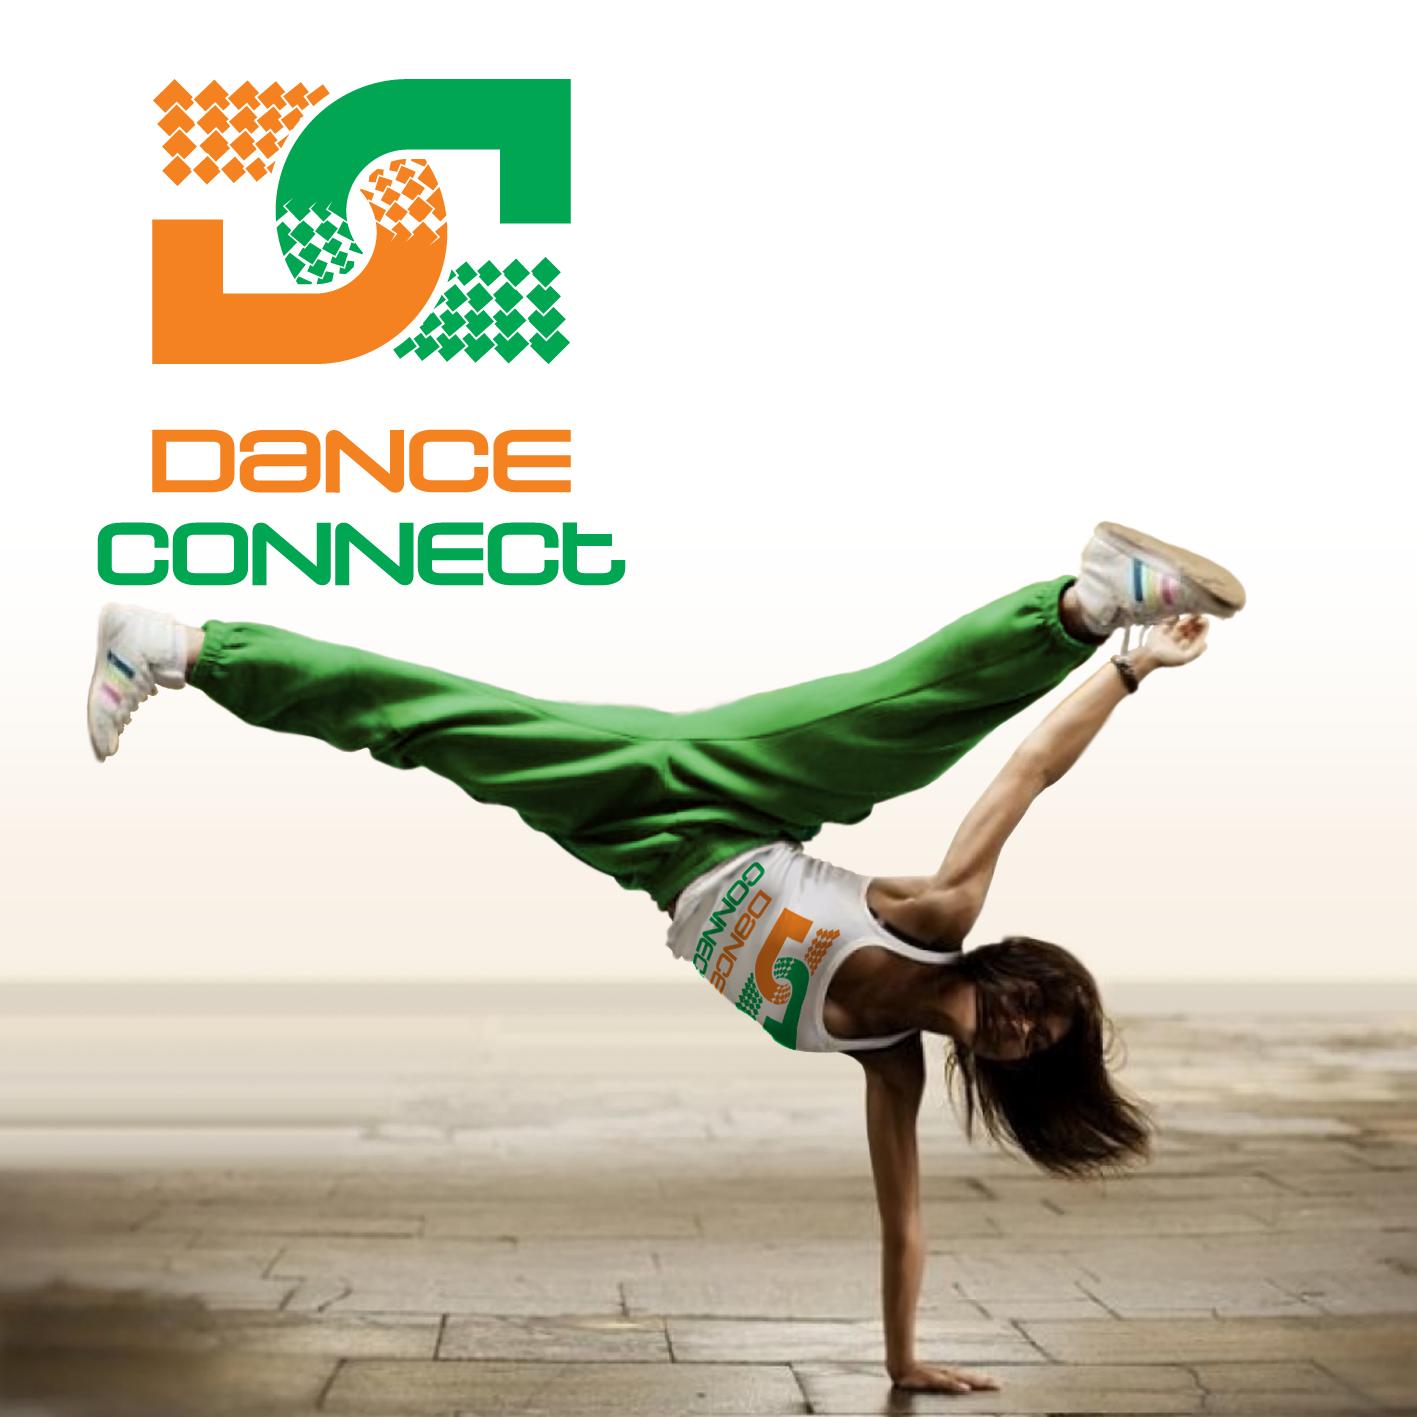 Разработка лого для спортивного портала www.danceconnect.ru фото f_4105b435bf8c5fcc.png